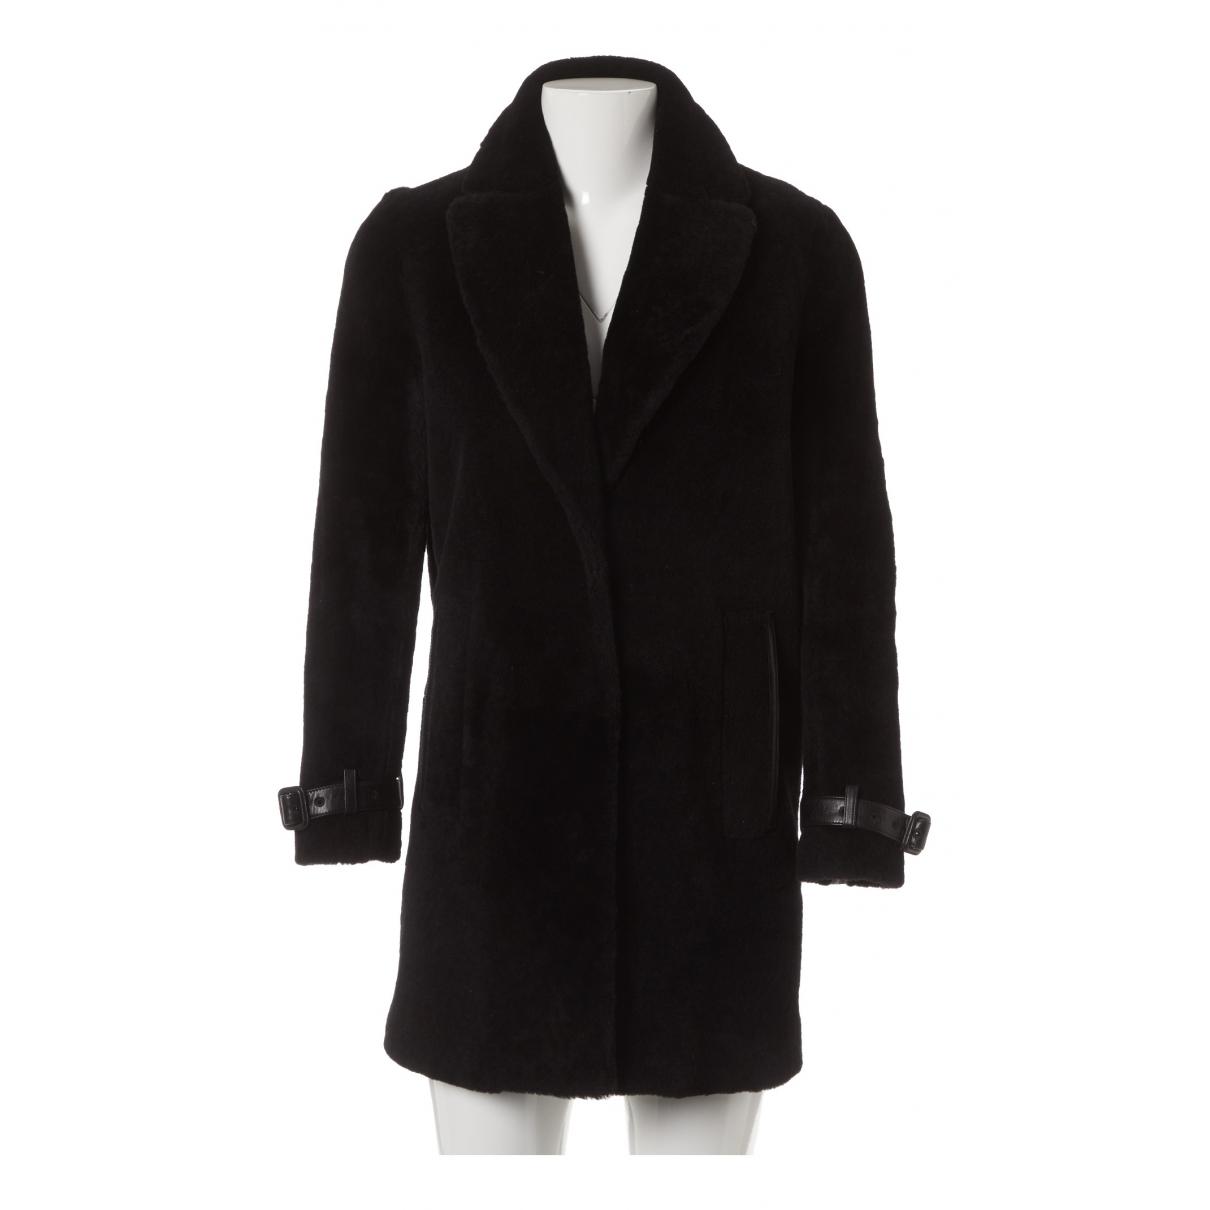 Burberry \N Black Shearling coat for Women 34 FR